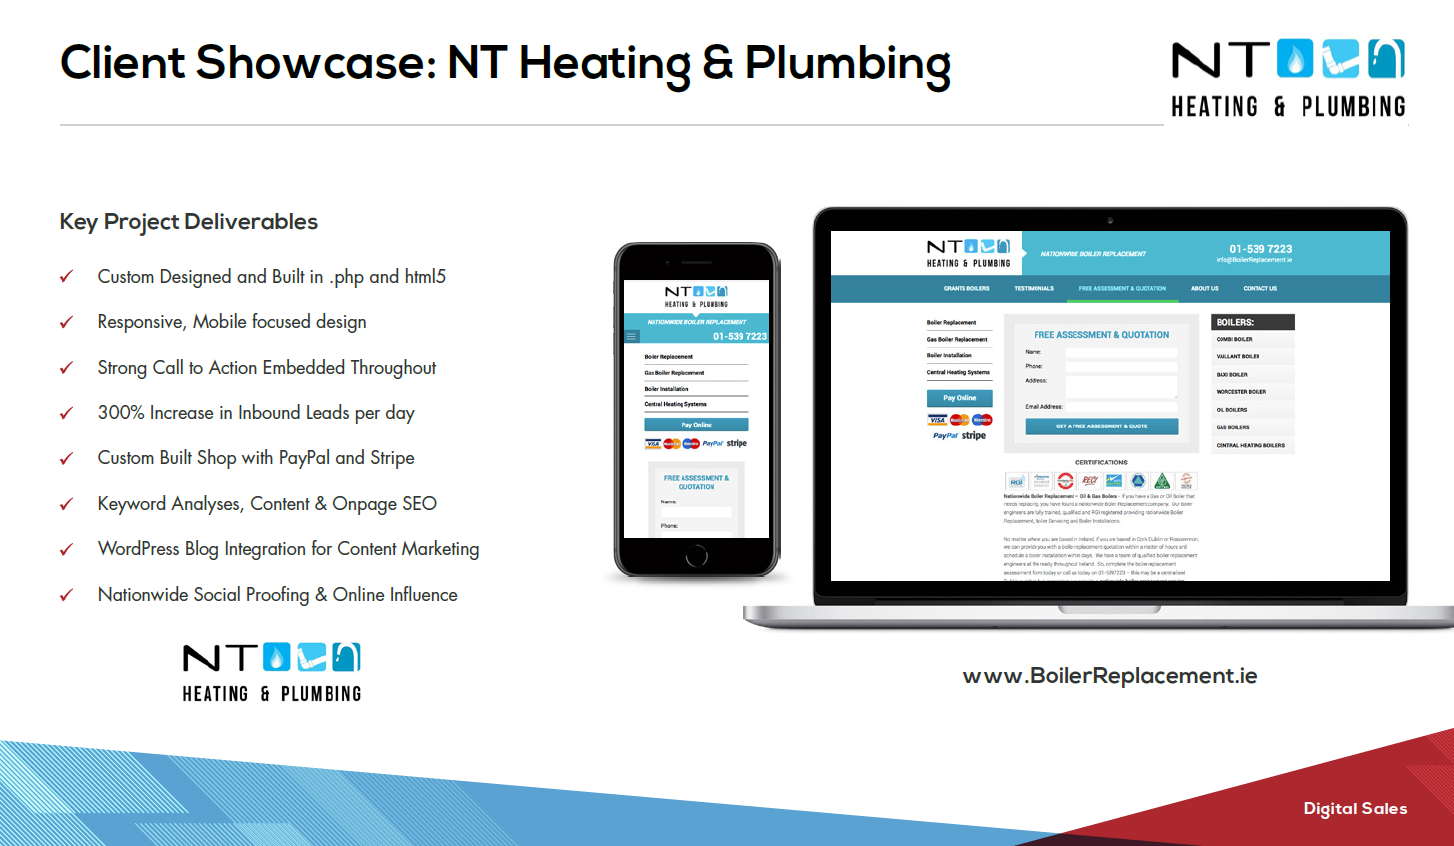 NT Heating and Plumbing Website Case Study